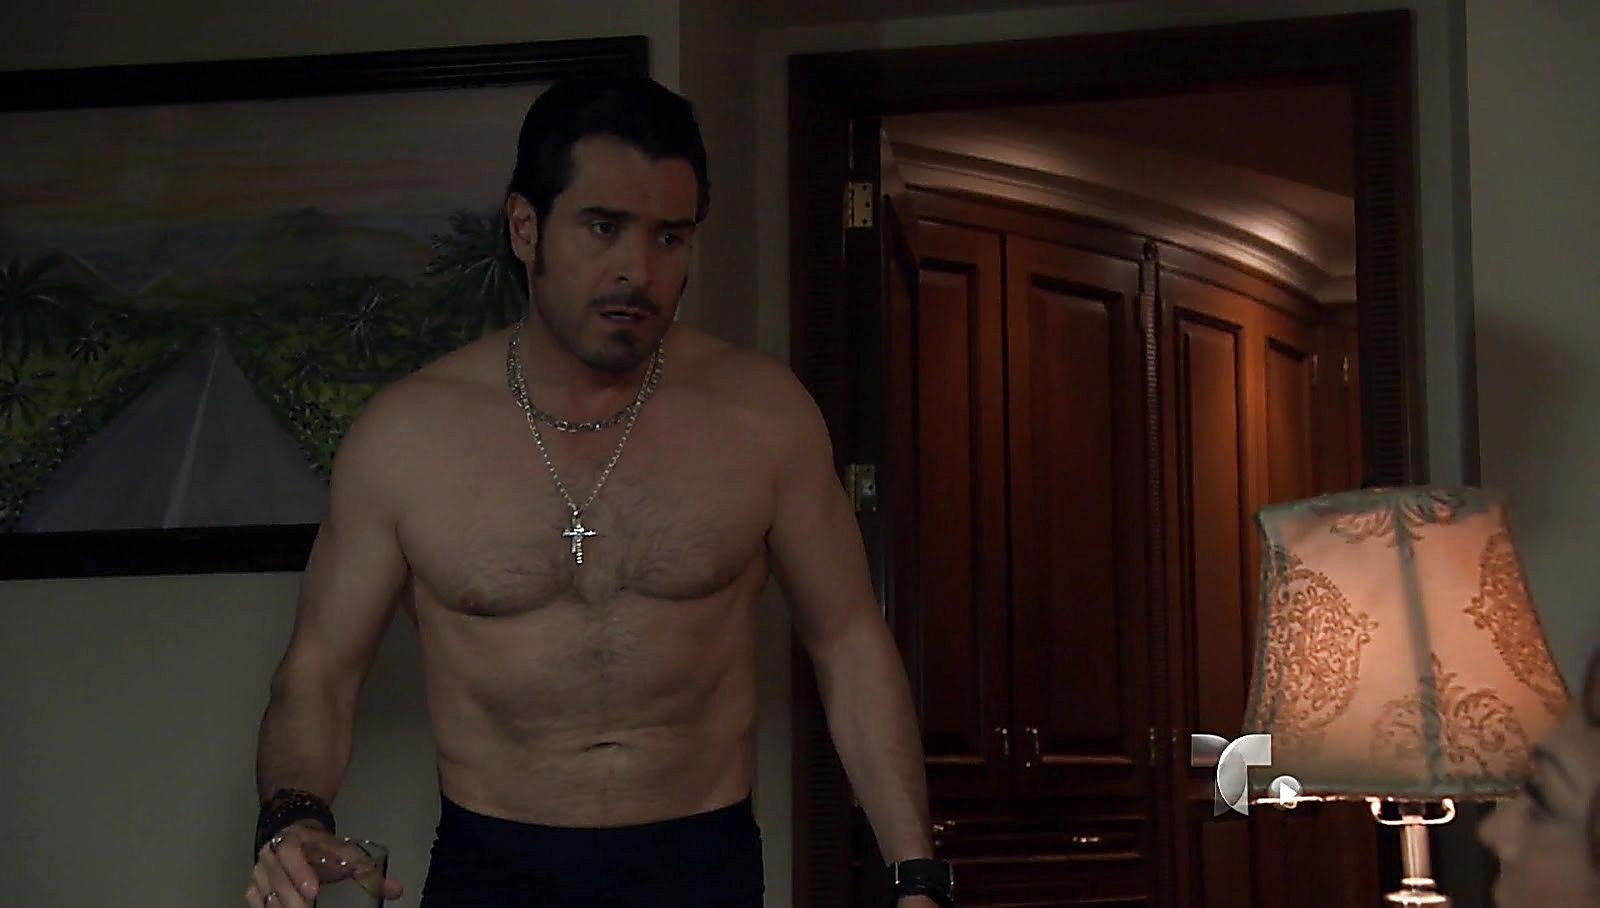 Rafael Novoa sexy shirtless scene August 24, 2017, 12pm